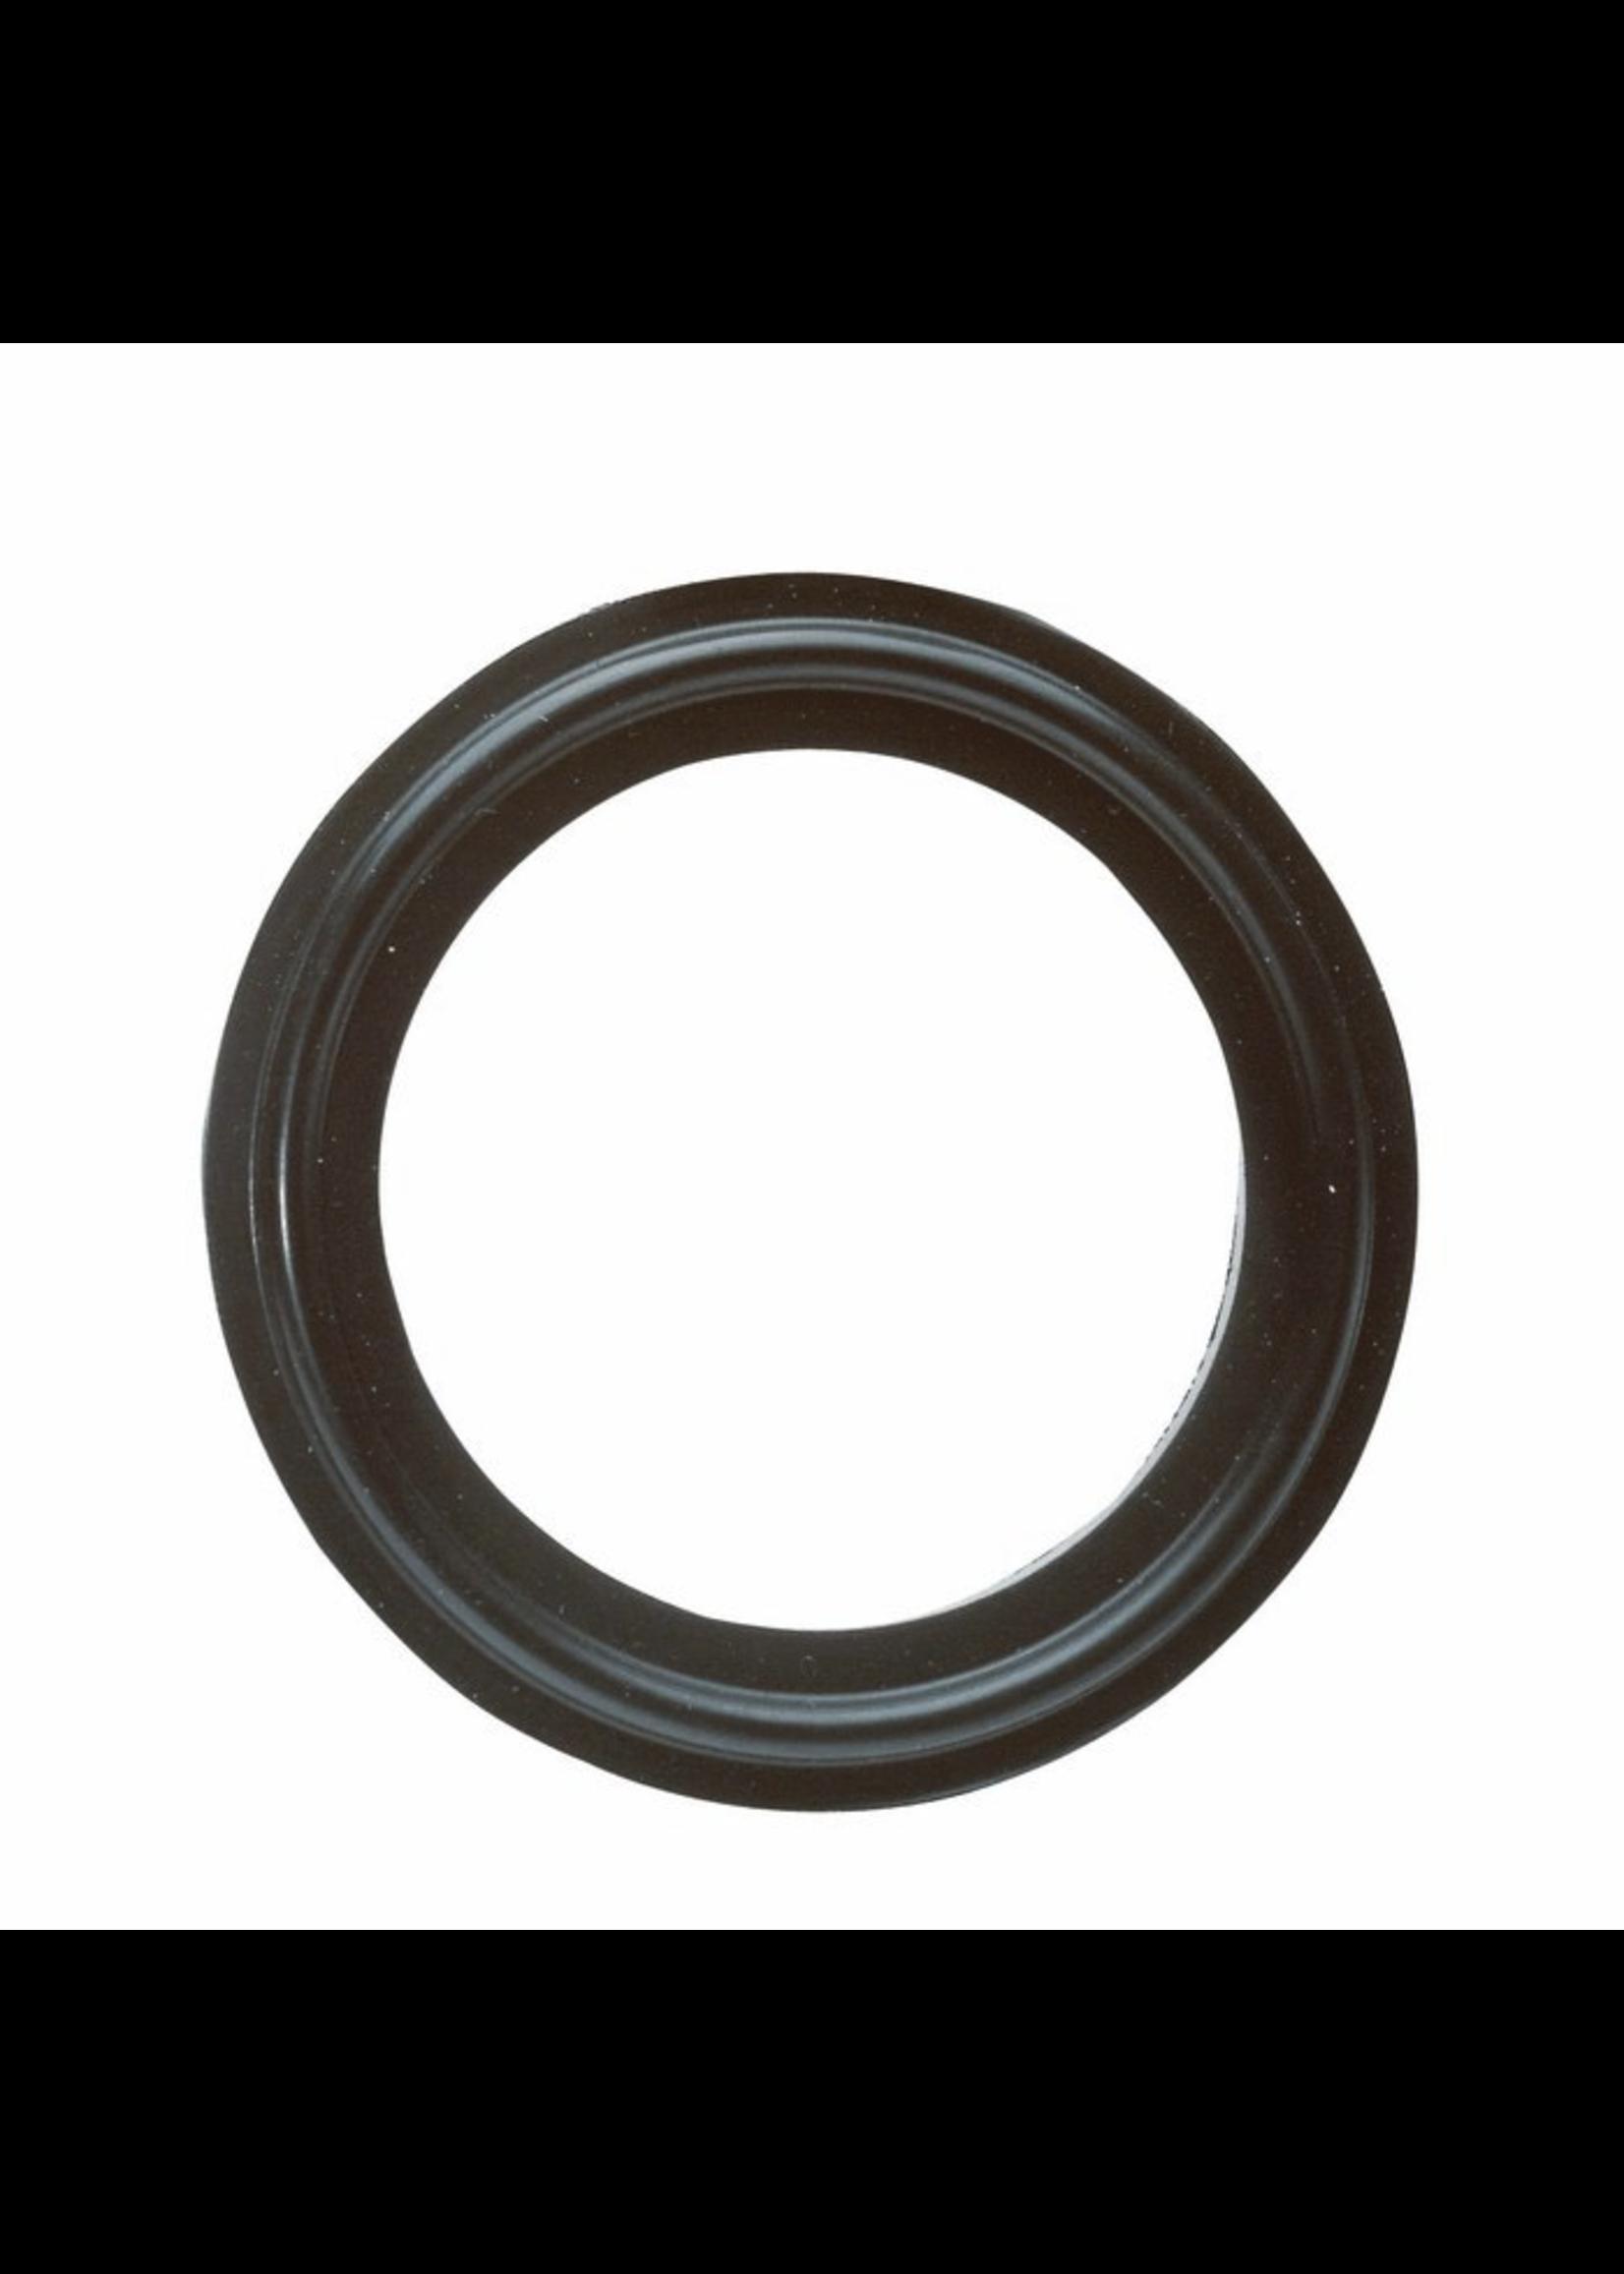 "Fittings 1.5"" Black Buna EPDM Tri-Clamp Gasket"